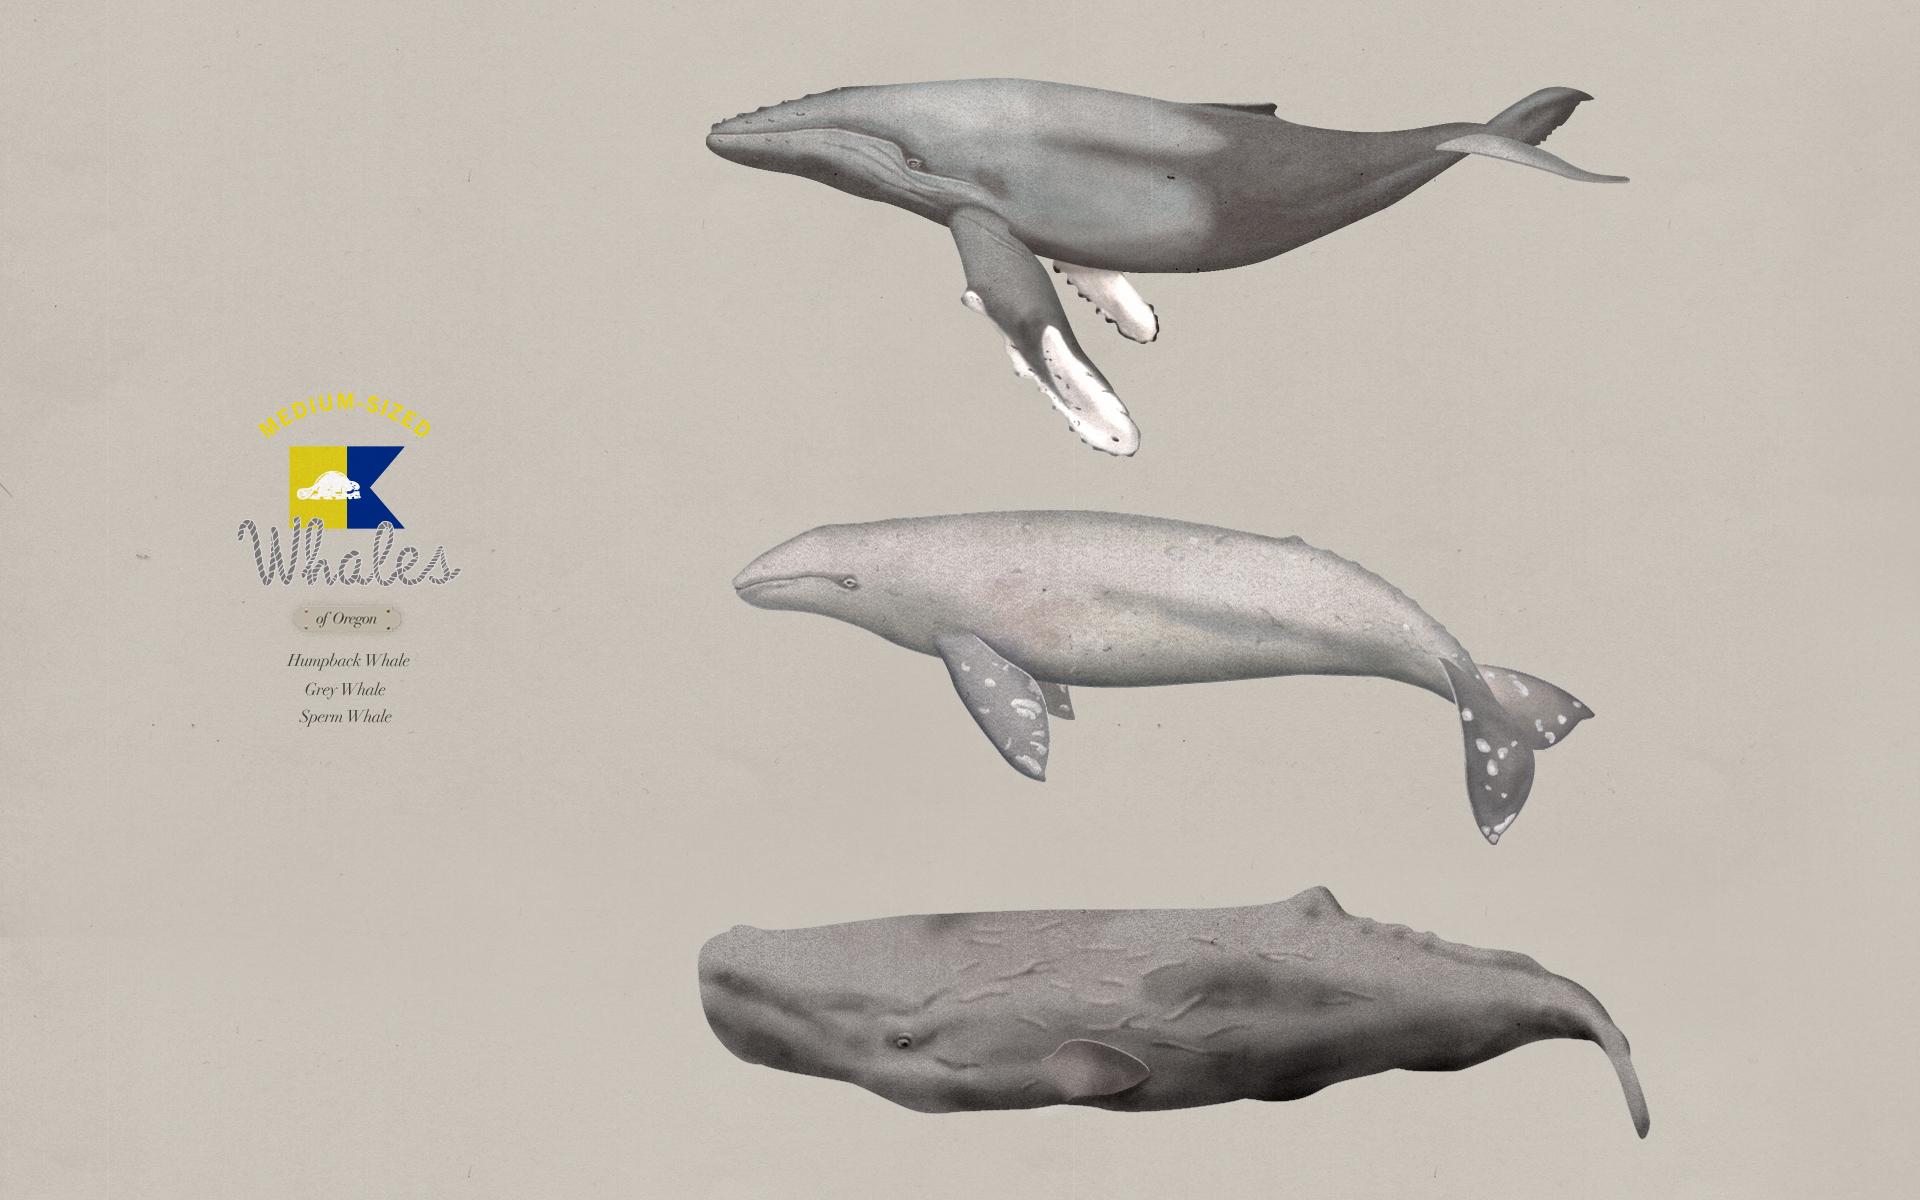 Desktop Wallpaper, Whales of Oregon : FORTPORT